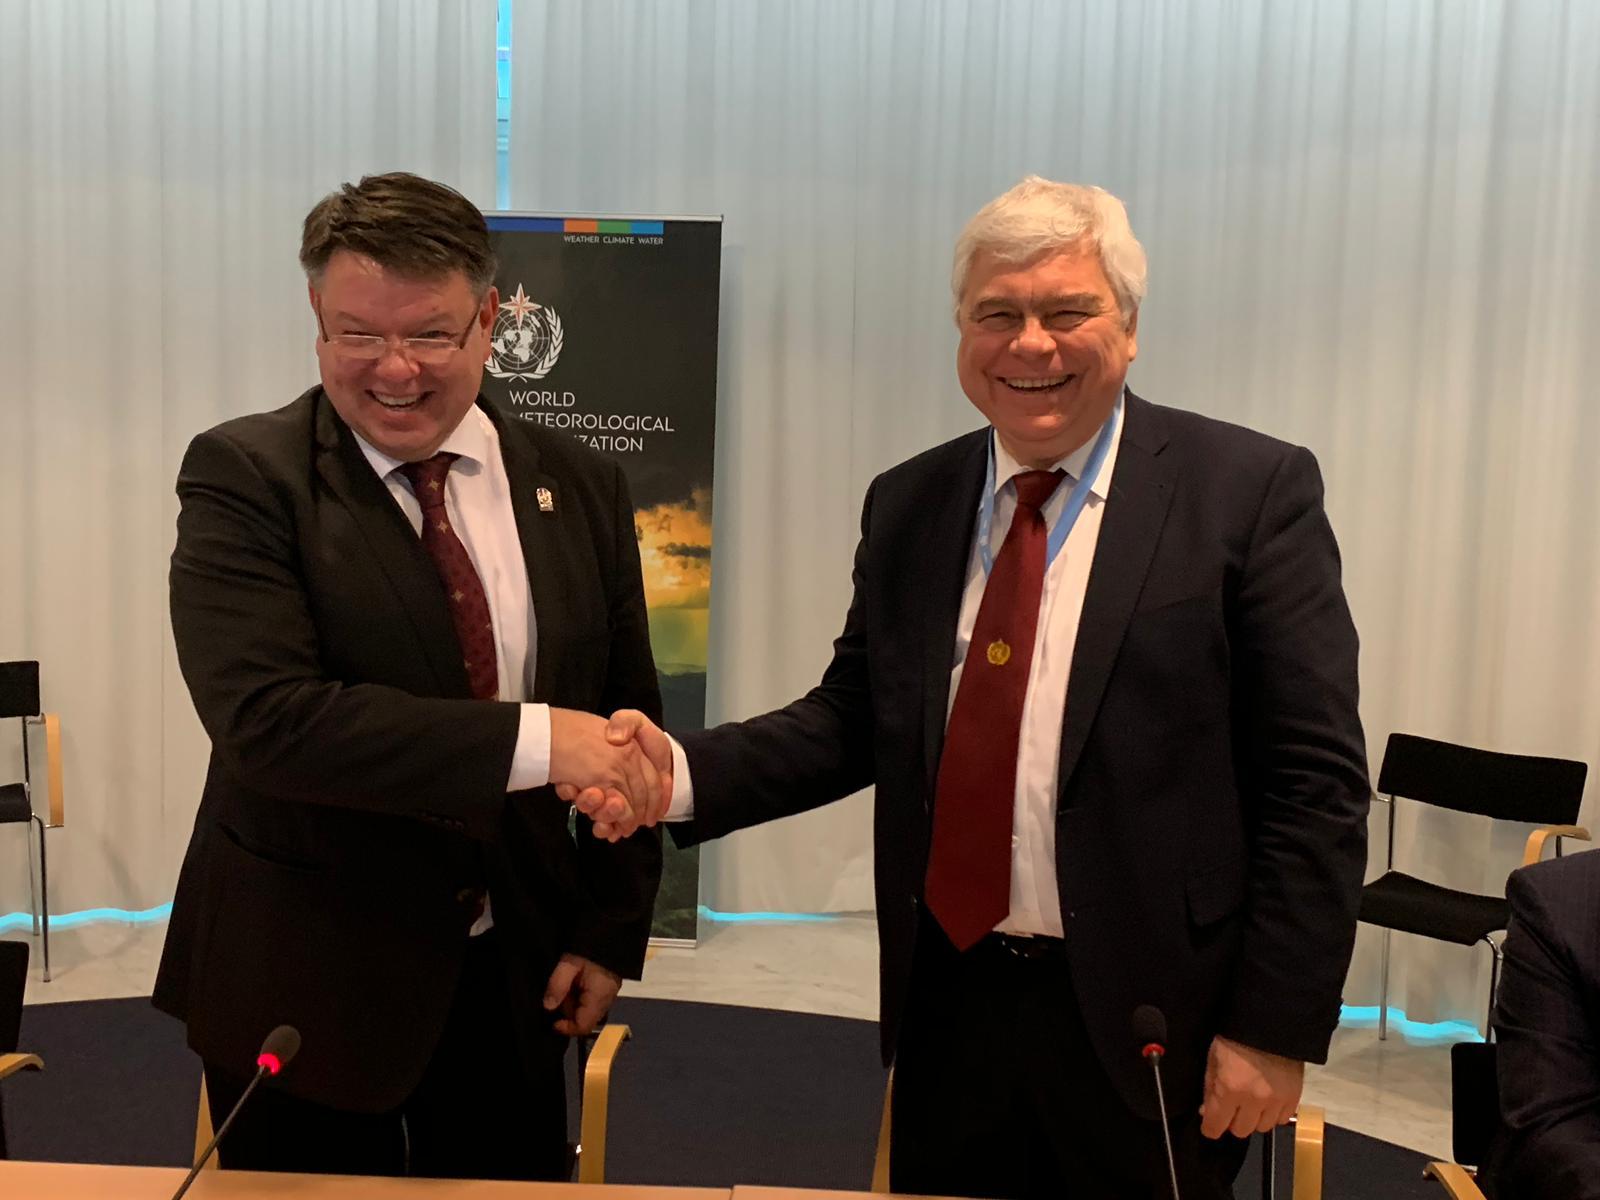 WMO SG Petteri Taalas and UNESCO-IOC Vladimir Ryabinin